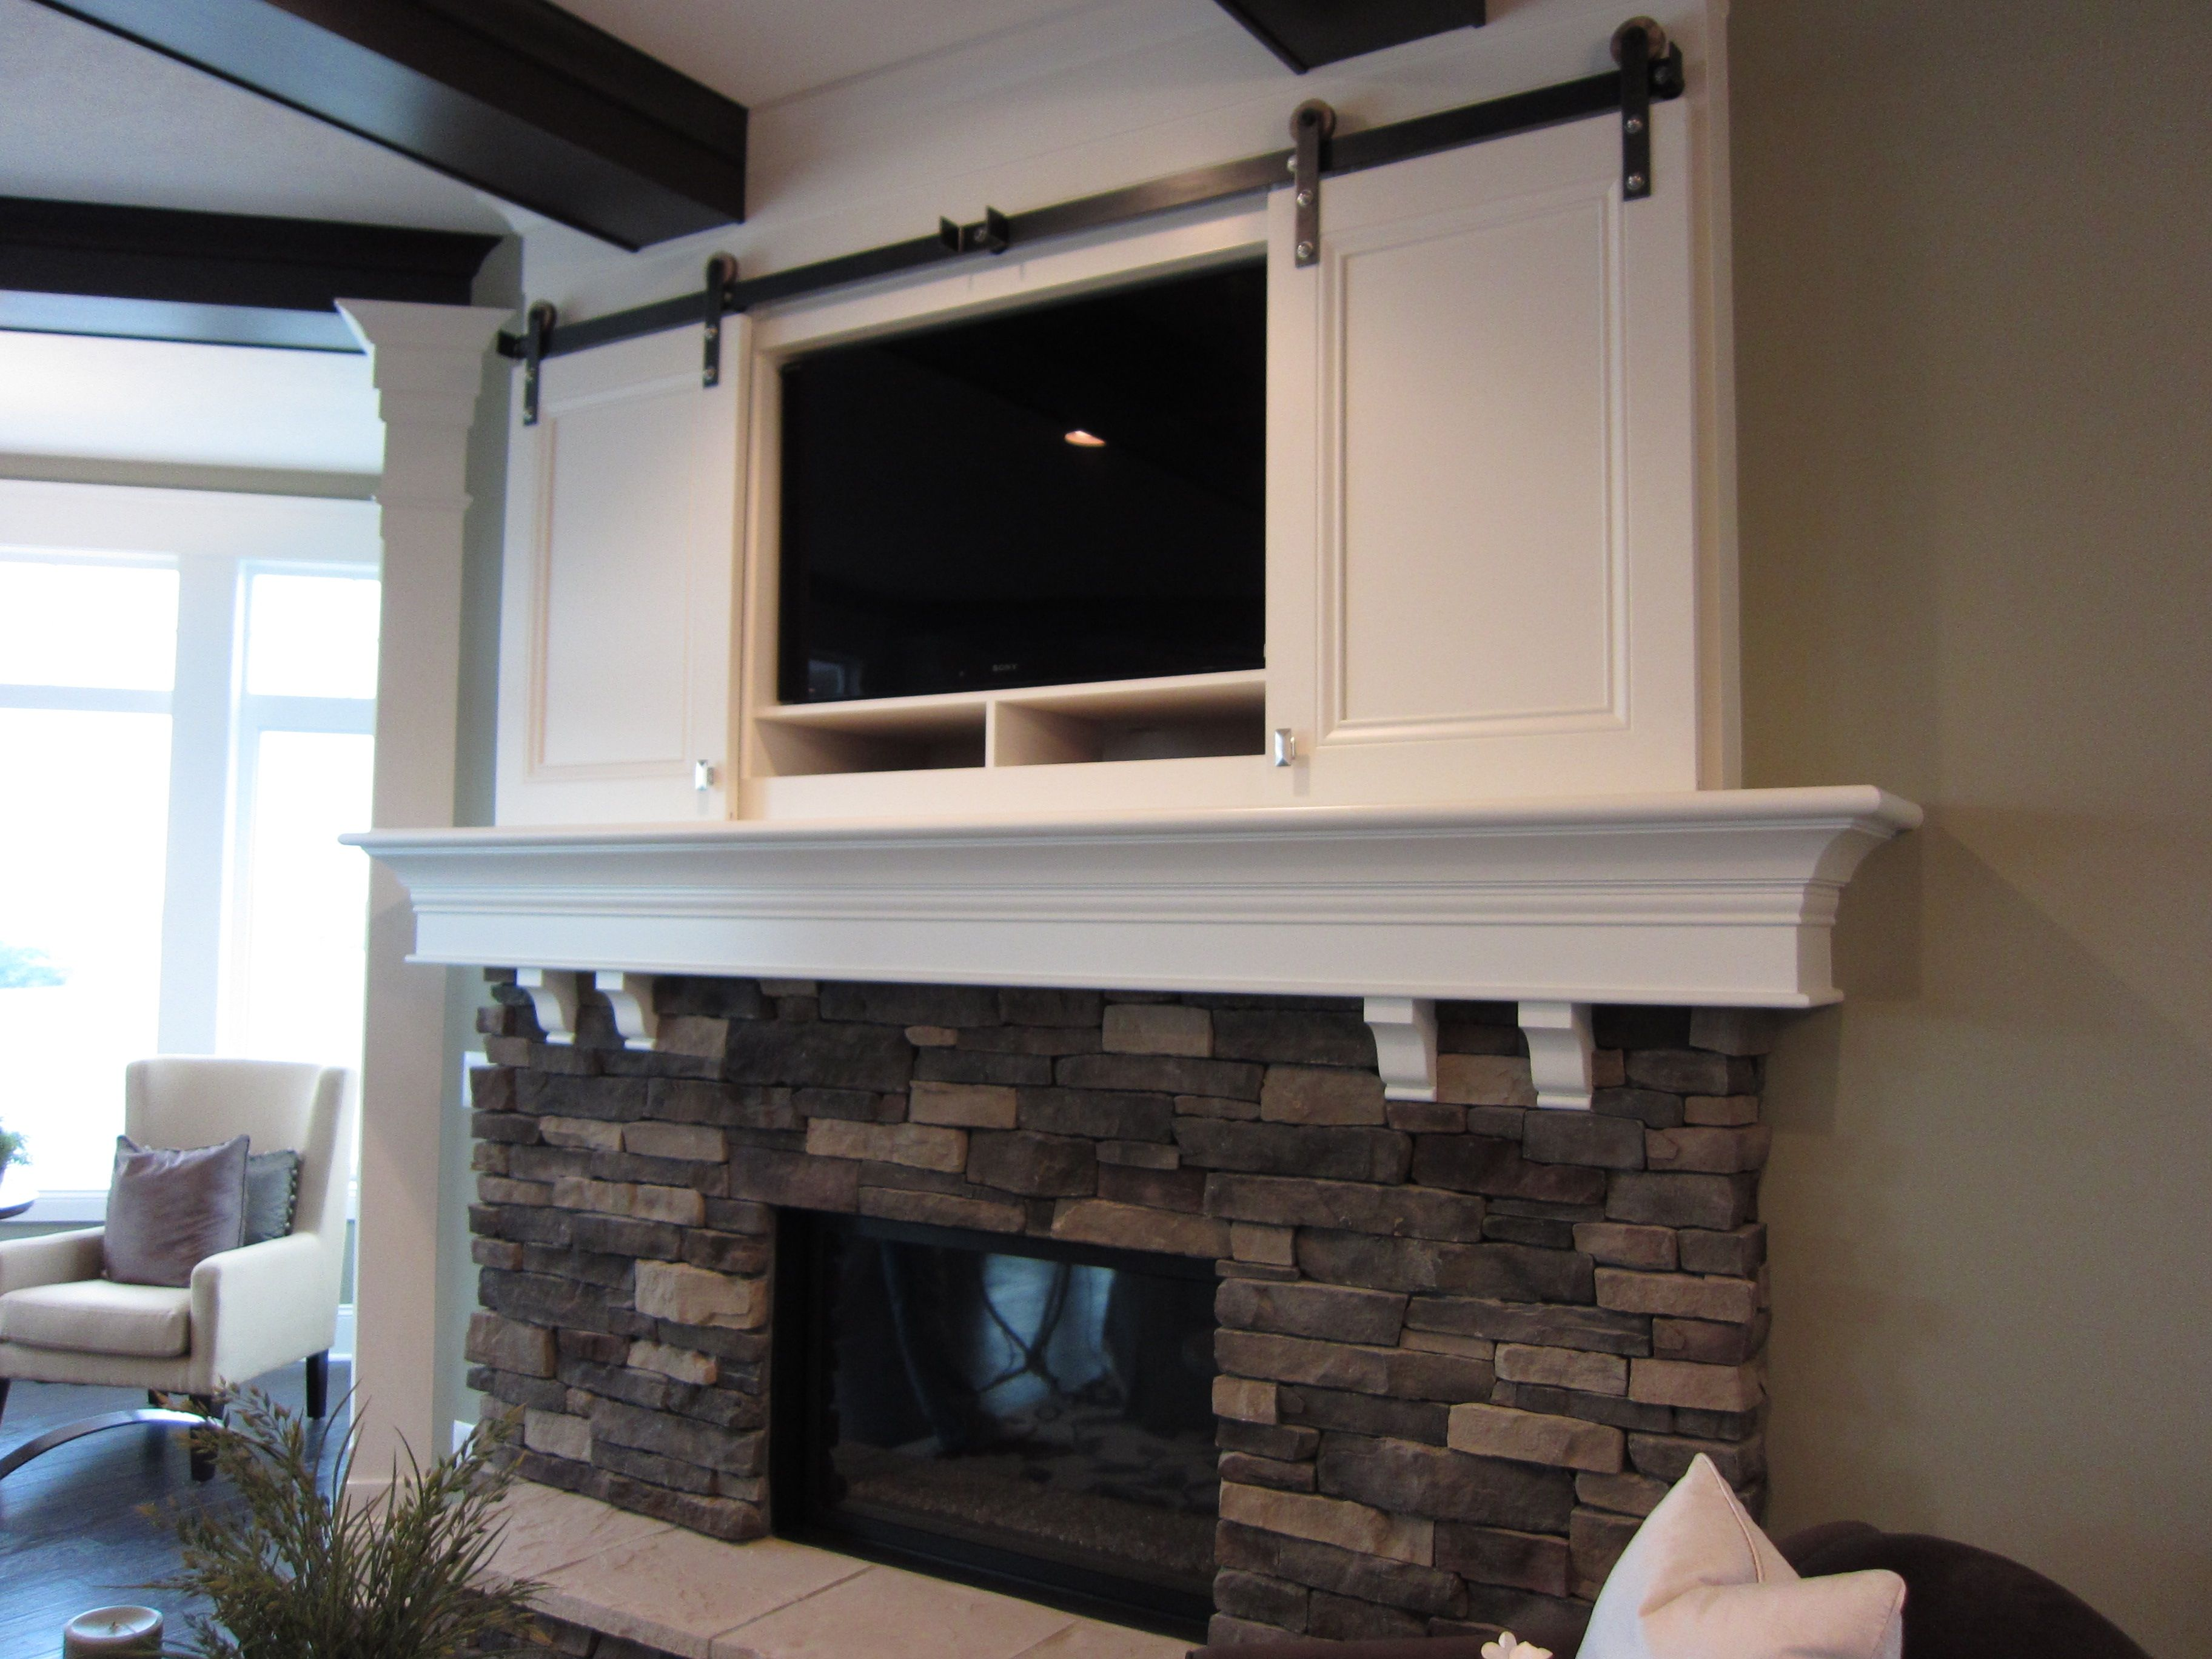 Tv Above Fireplace Heat Fresh Fireplace Tv Mantel Ideas Best 25 Tv Above Fireplace Ideas